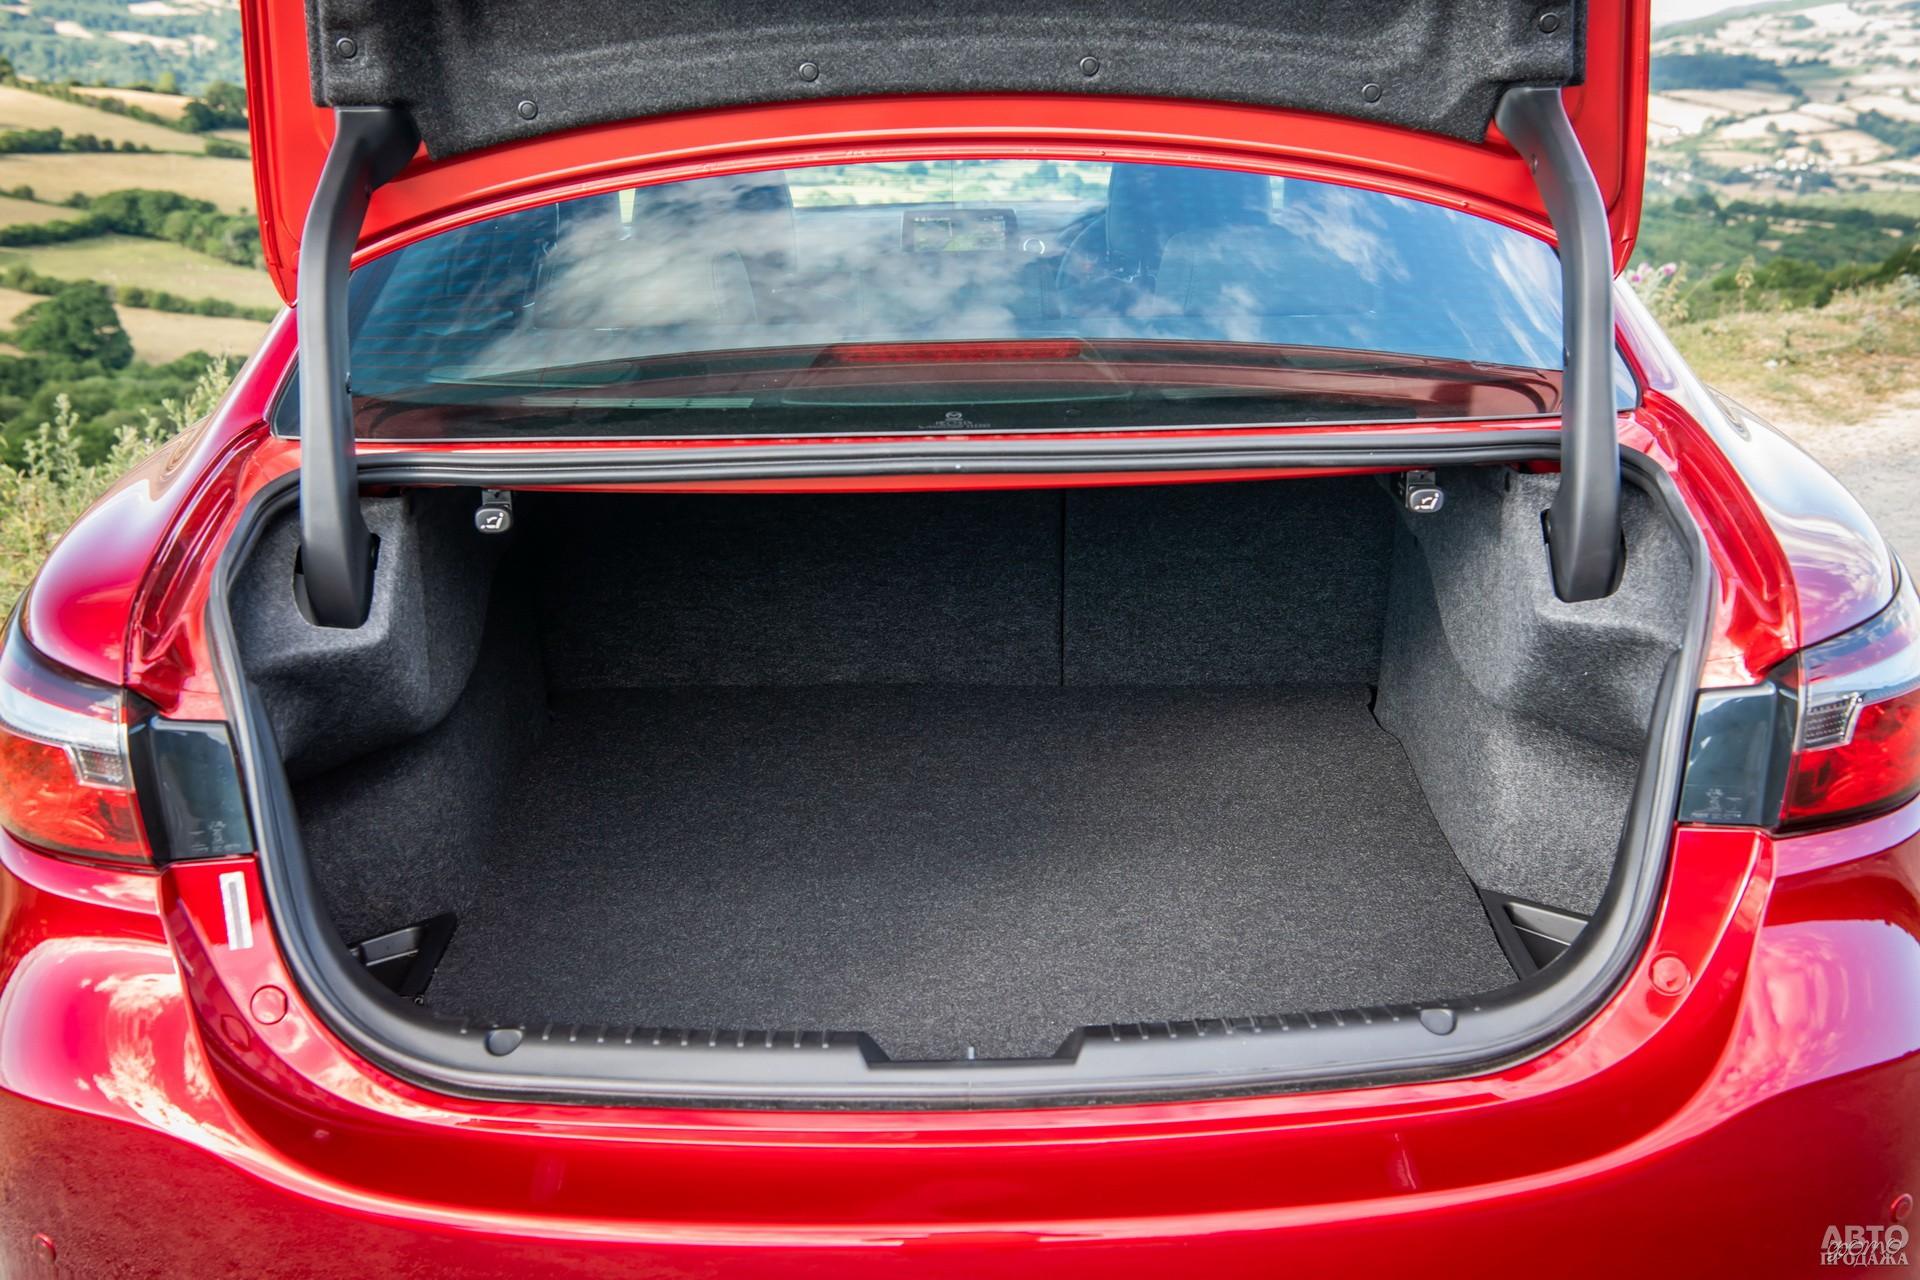 Объем багажника Mаzda – 480 л